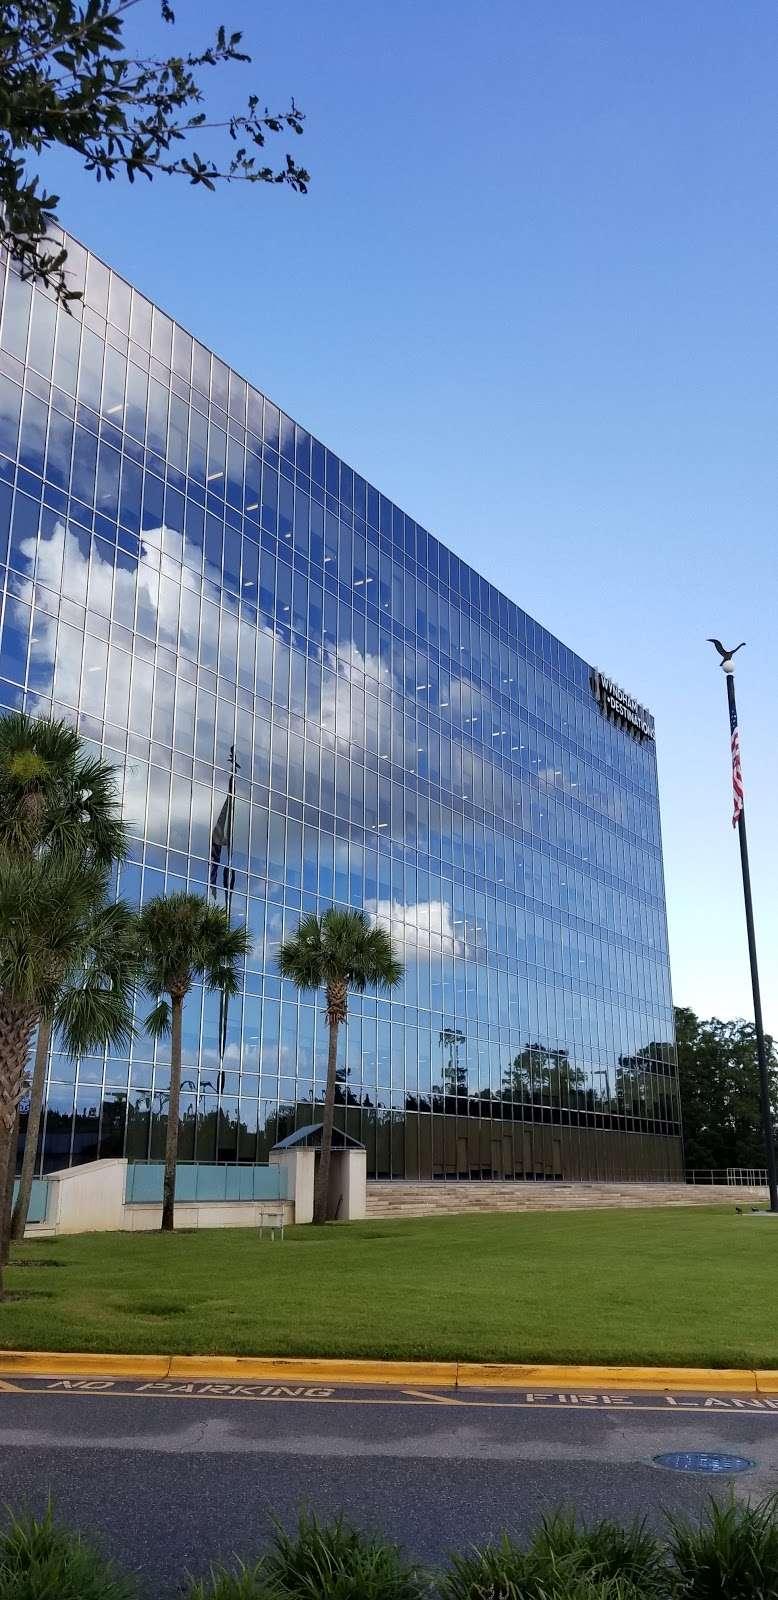 Wyndham Destinations - real estate agency  | Photo 5 of 8 | Address: 6277 Sea Harbor Dr, Orlando, FL 32821, USA | Phone: (407) 626-5200